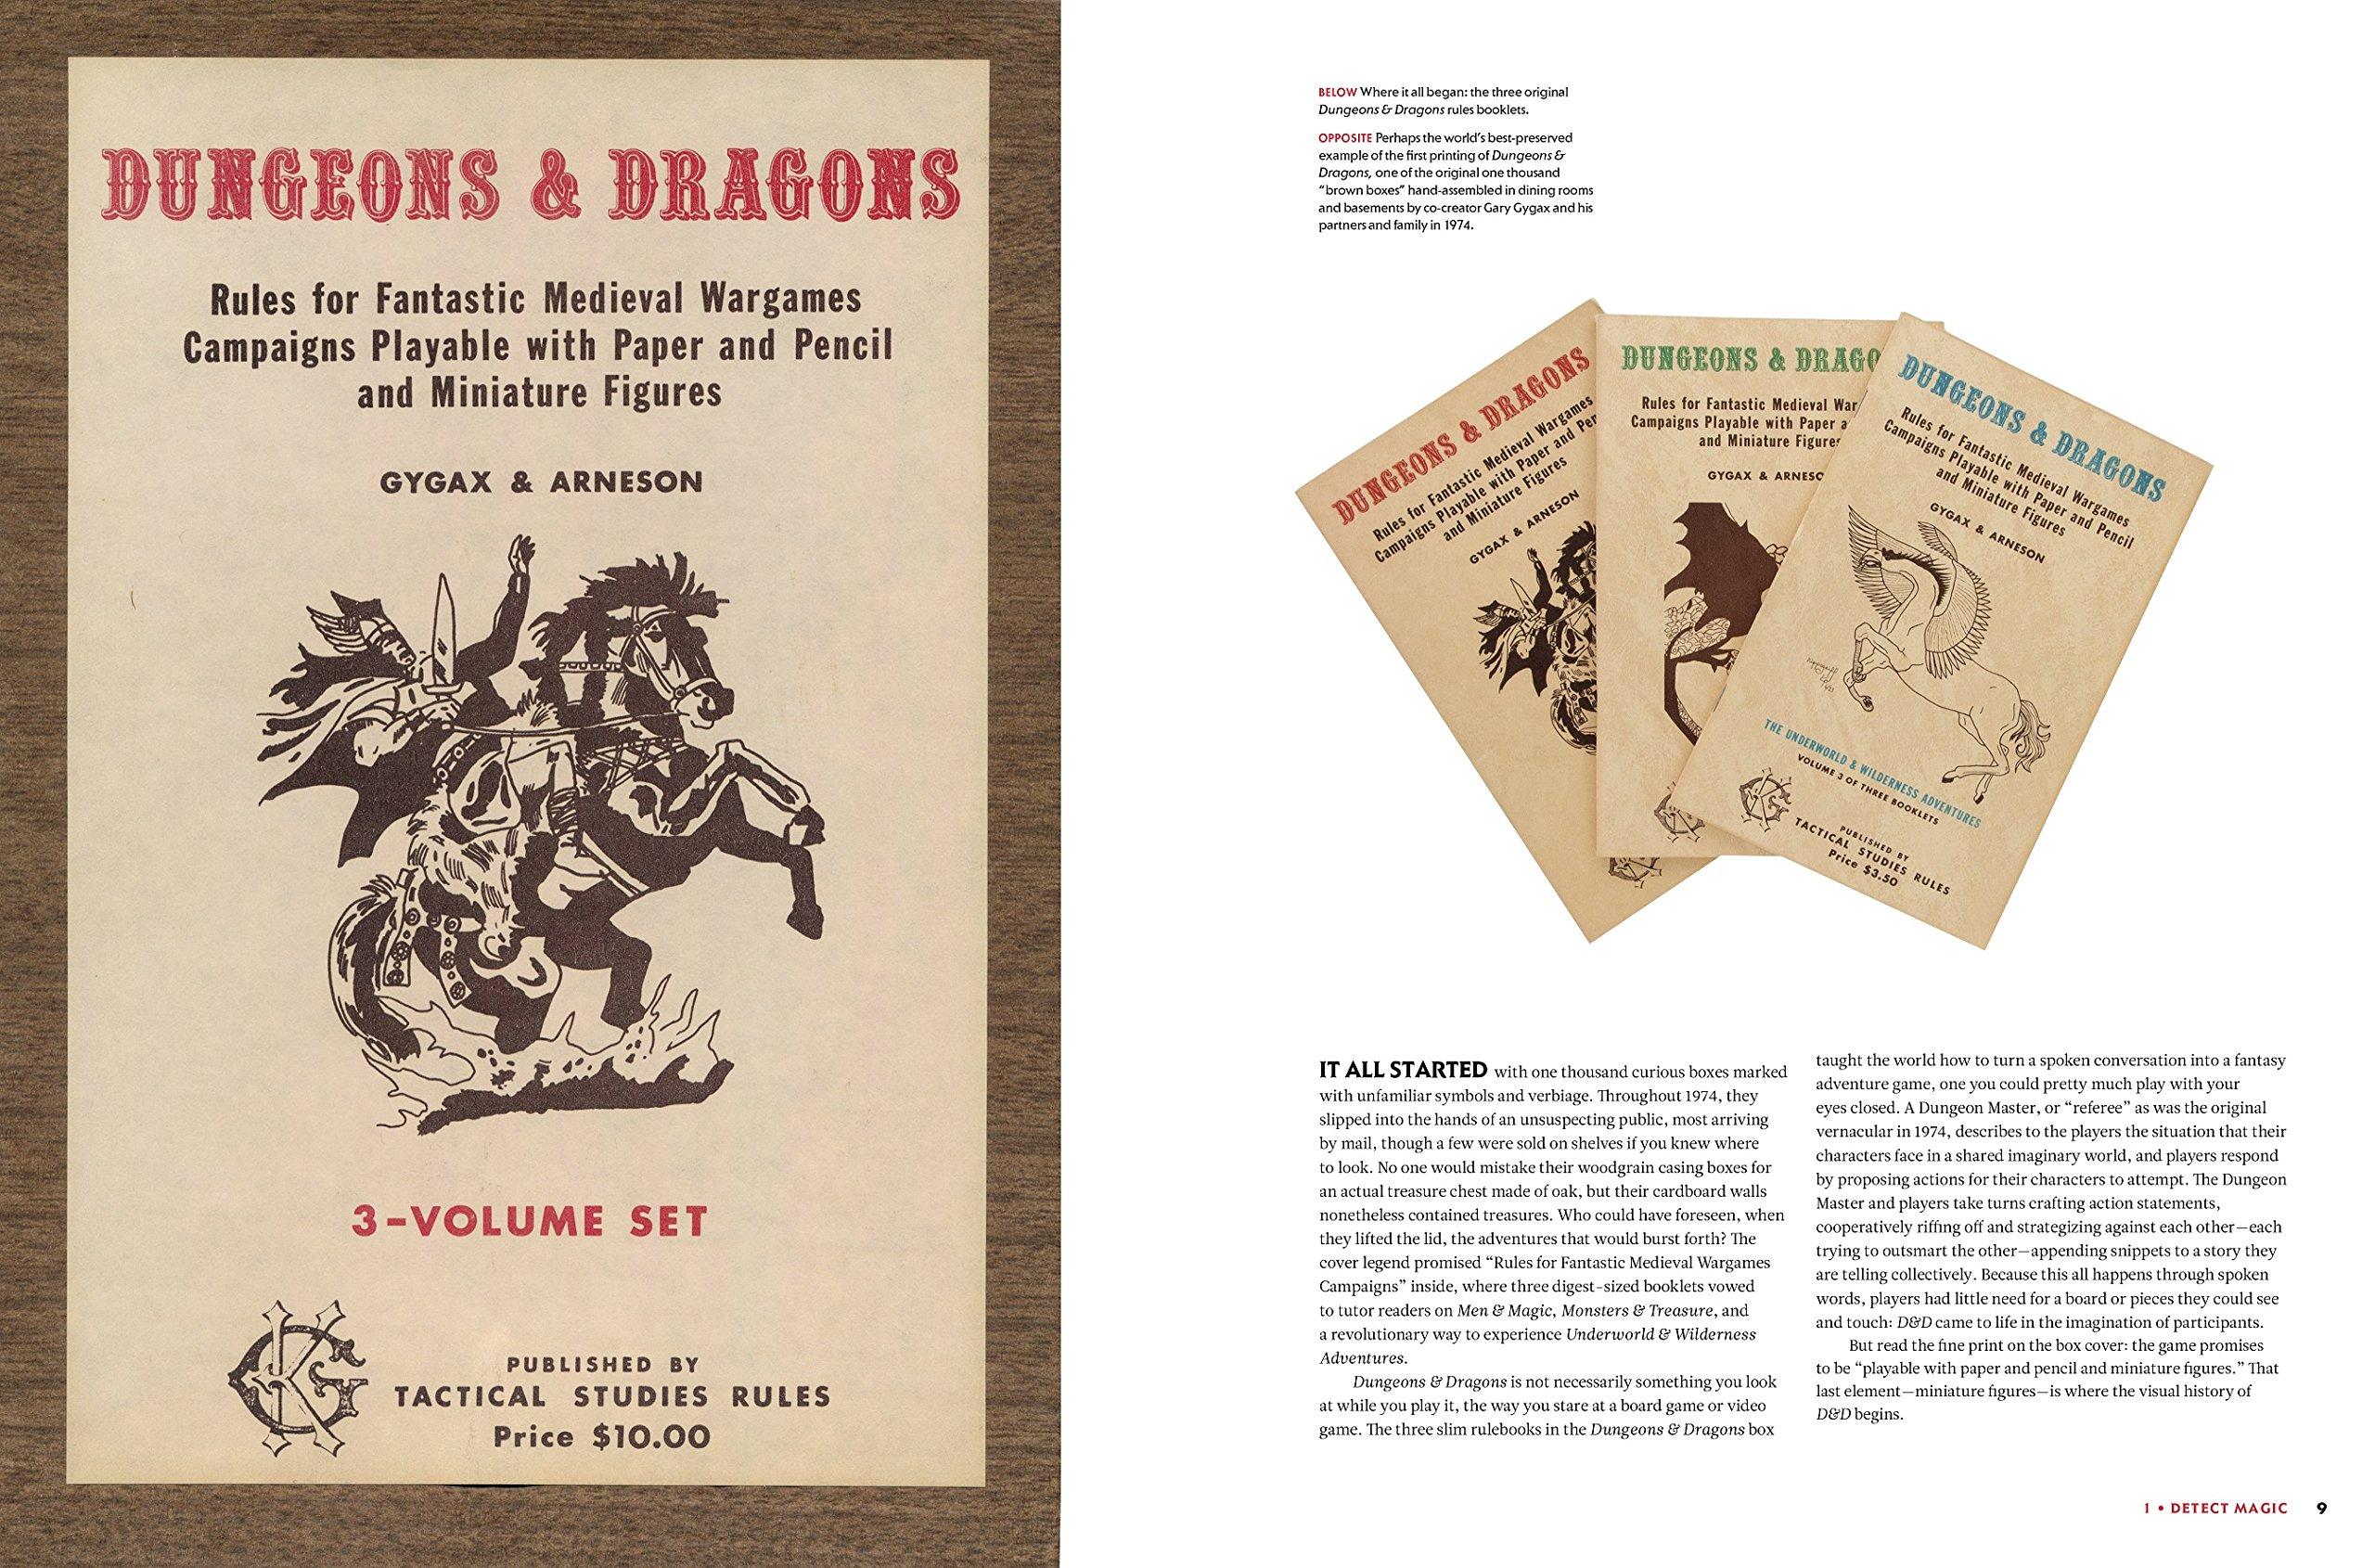 Dungeons and Dragons Art and Arcana thumbnail